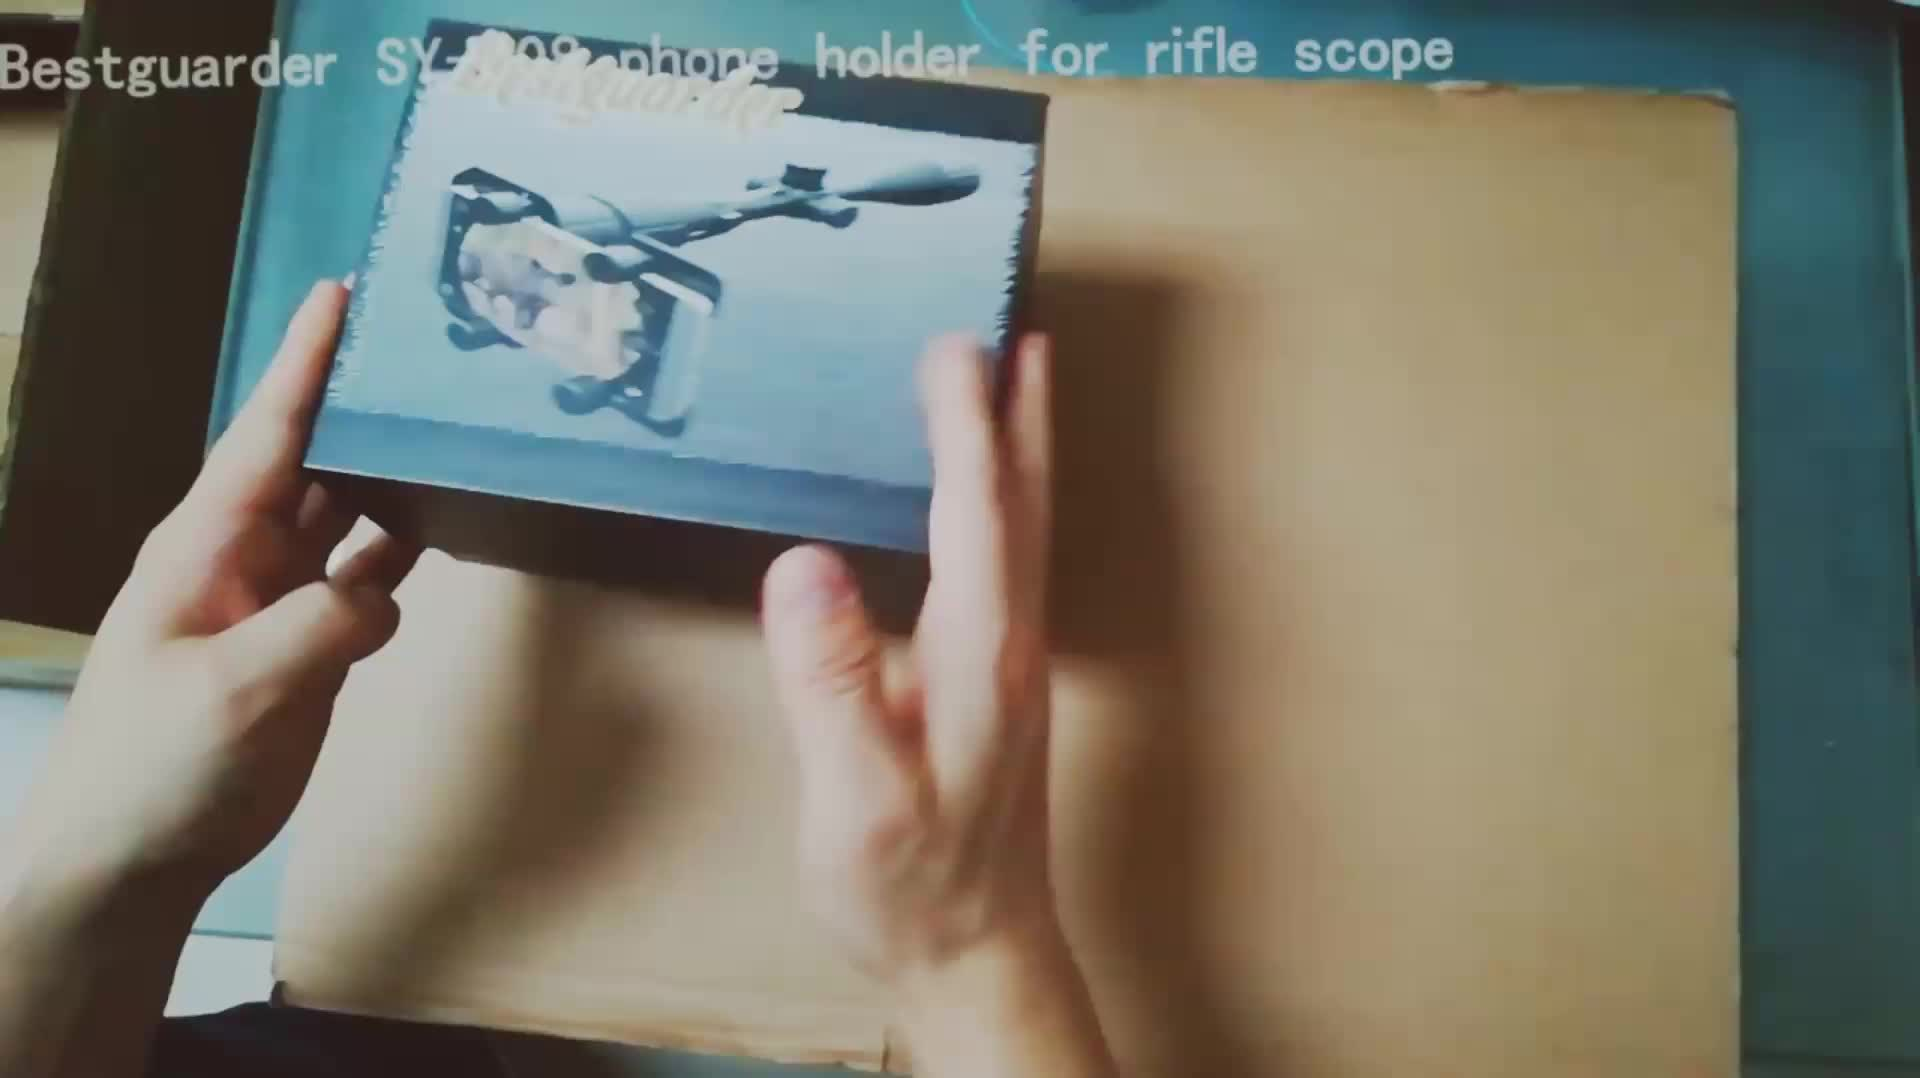 "4""-6"" smartphone Scope adaptor Bestguarder"